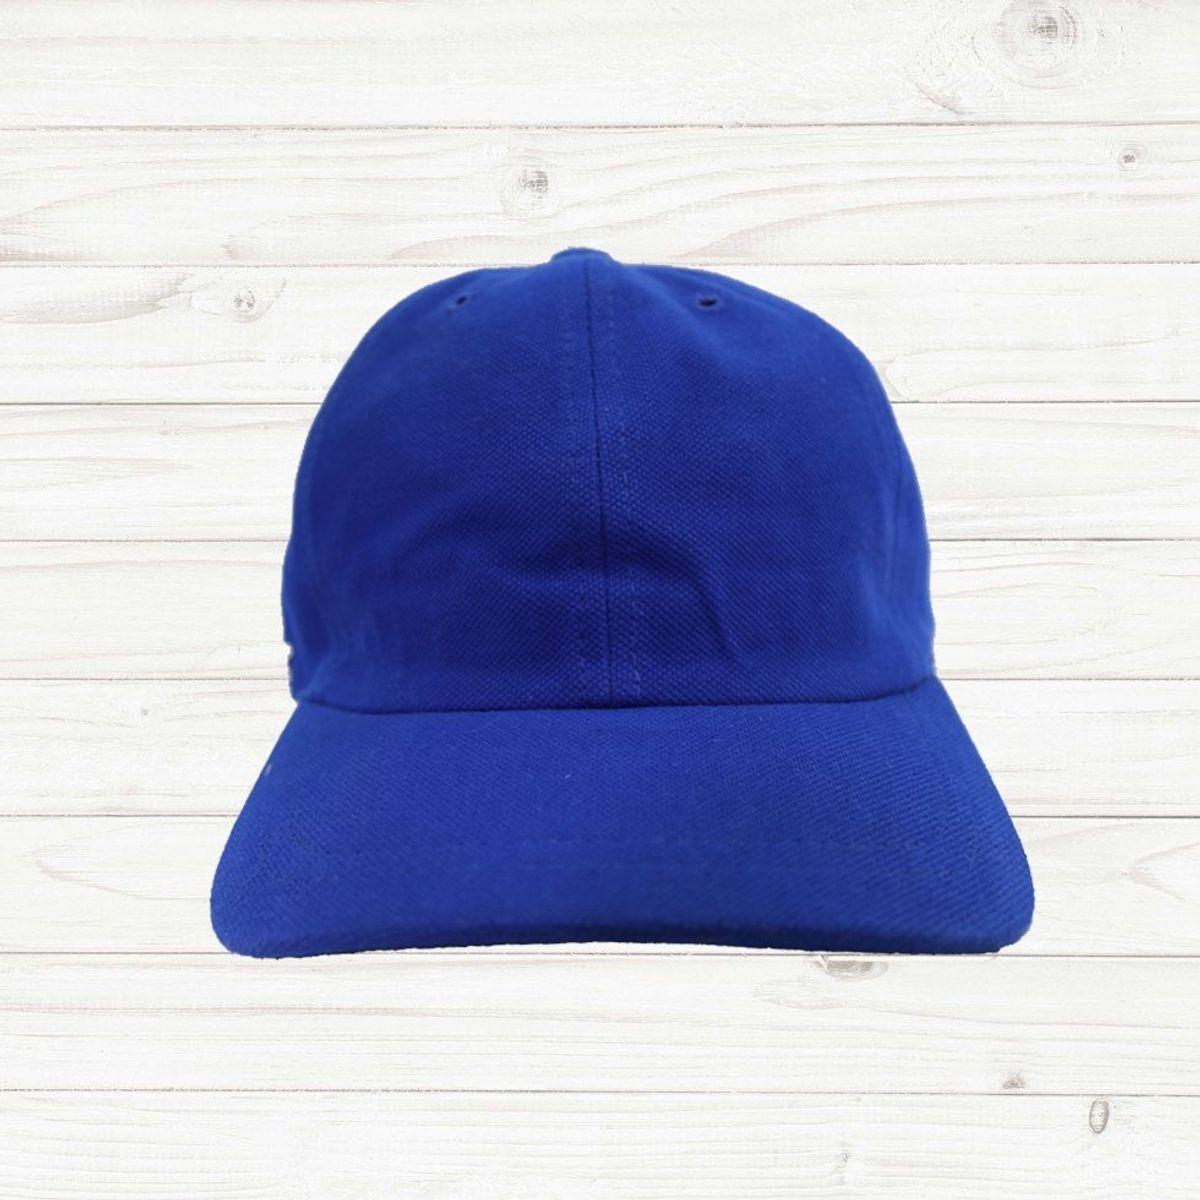 a4162b5af08 boné lacoste aba curva clássico azul - bonés lacoste